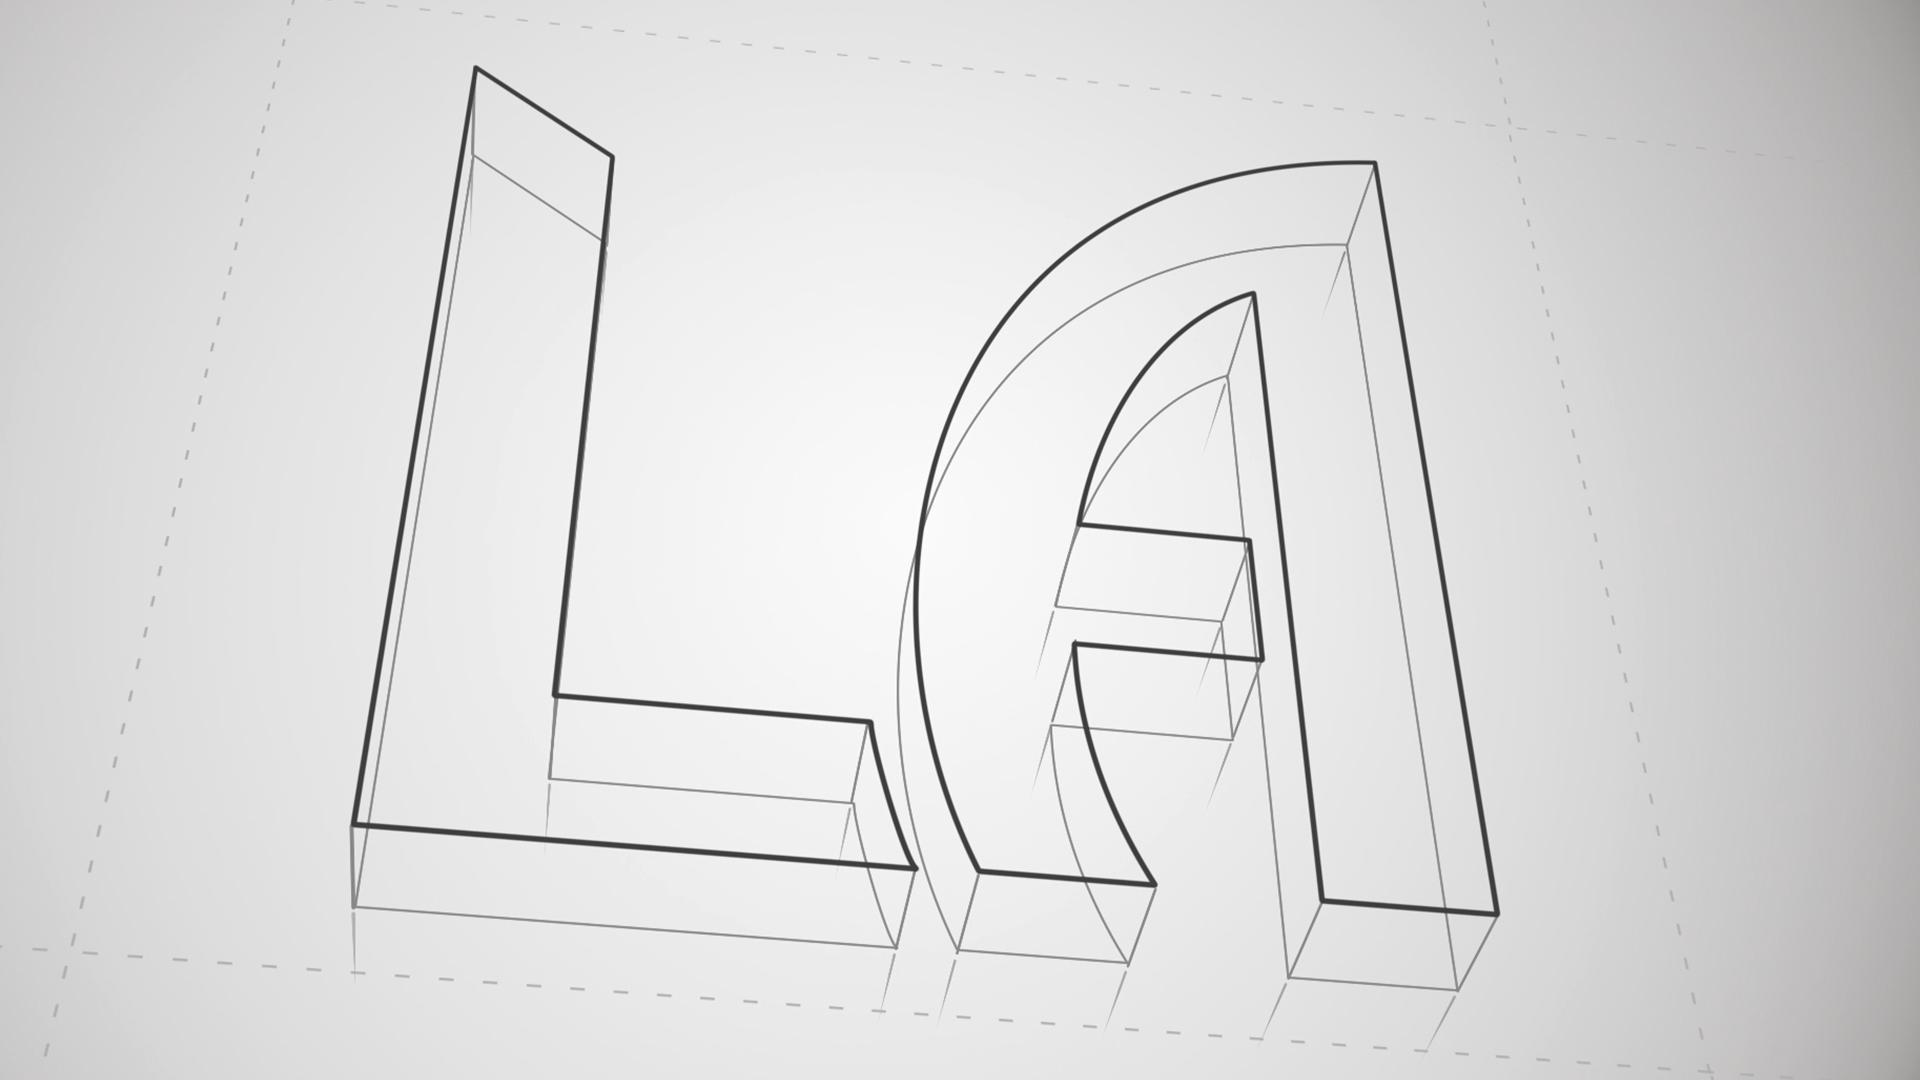 LAFC_thumbnail_01.jpg